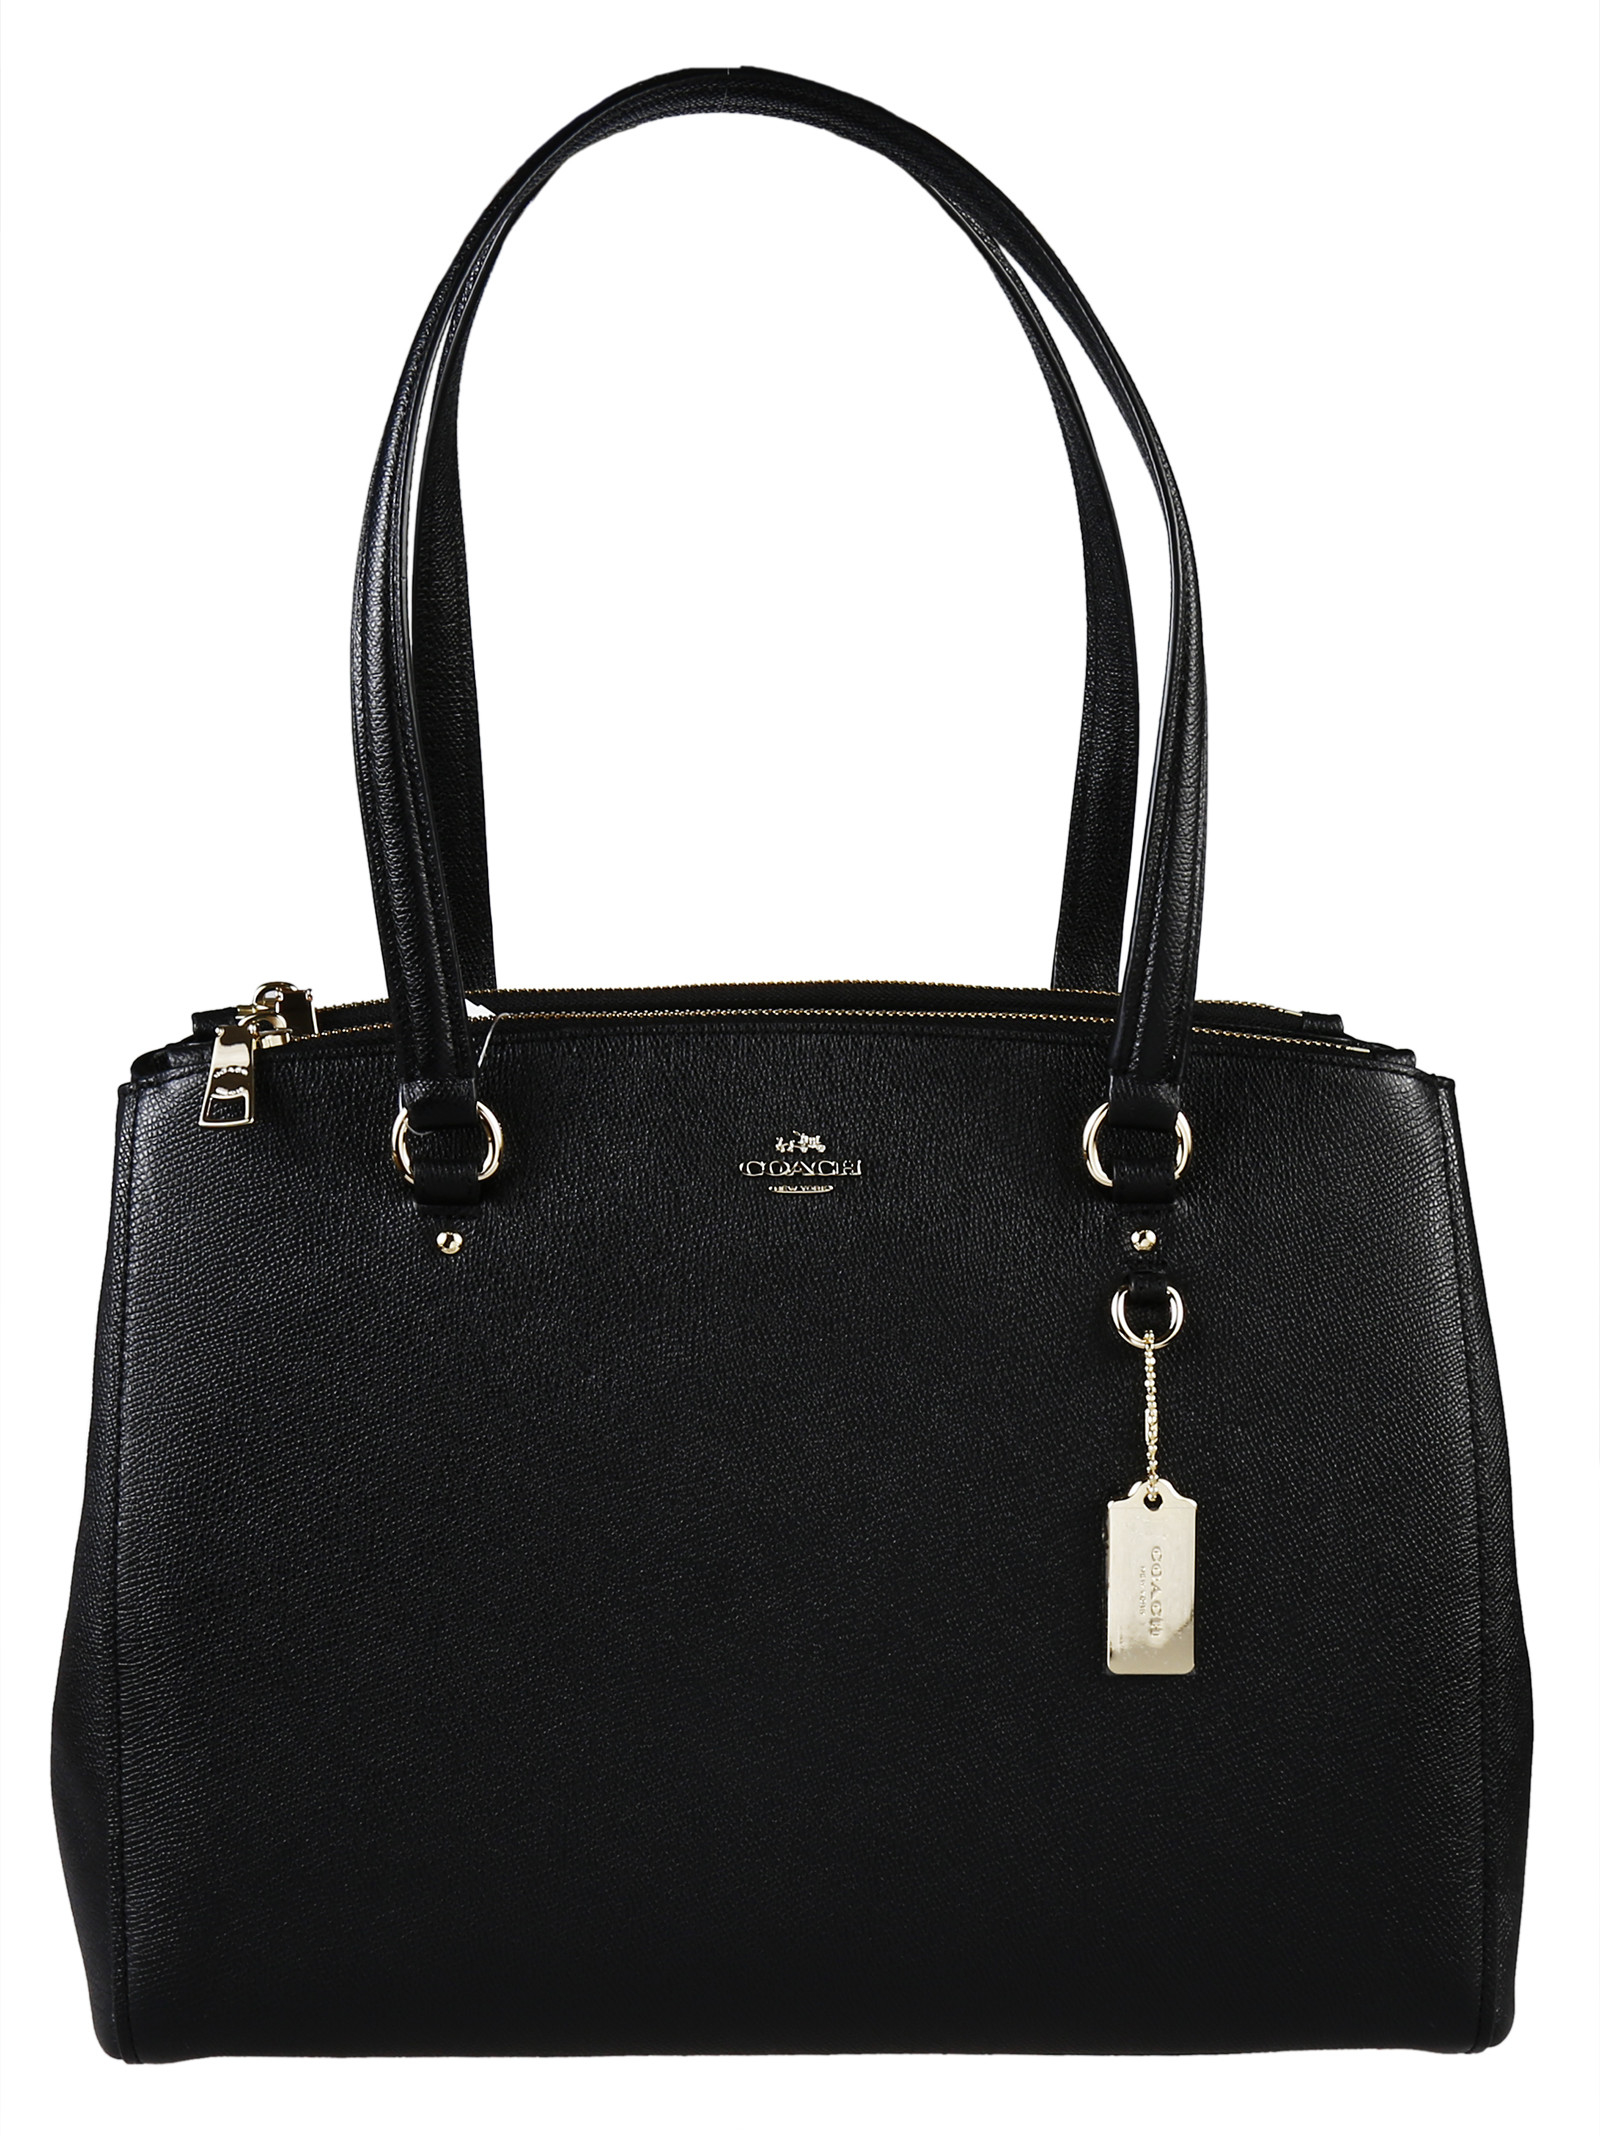 Coach Stanton Crossgrain Leather Bag in Black | Lyst